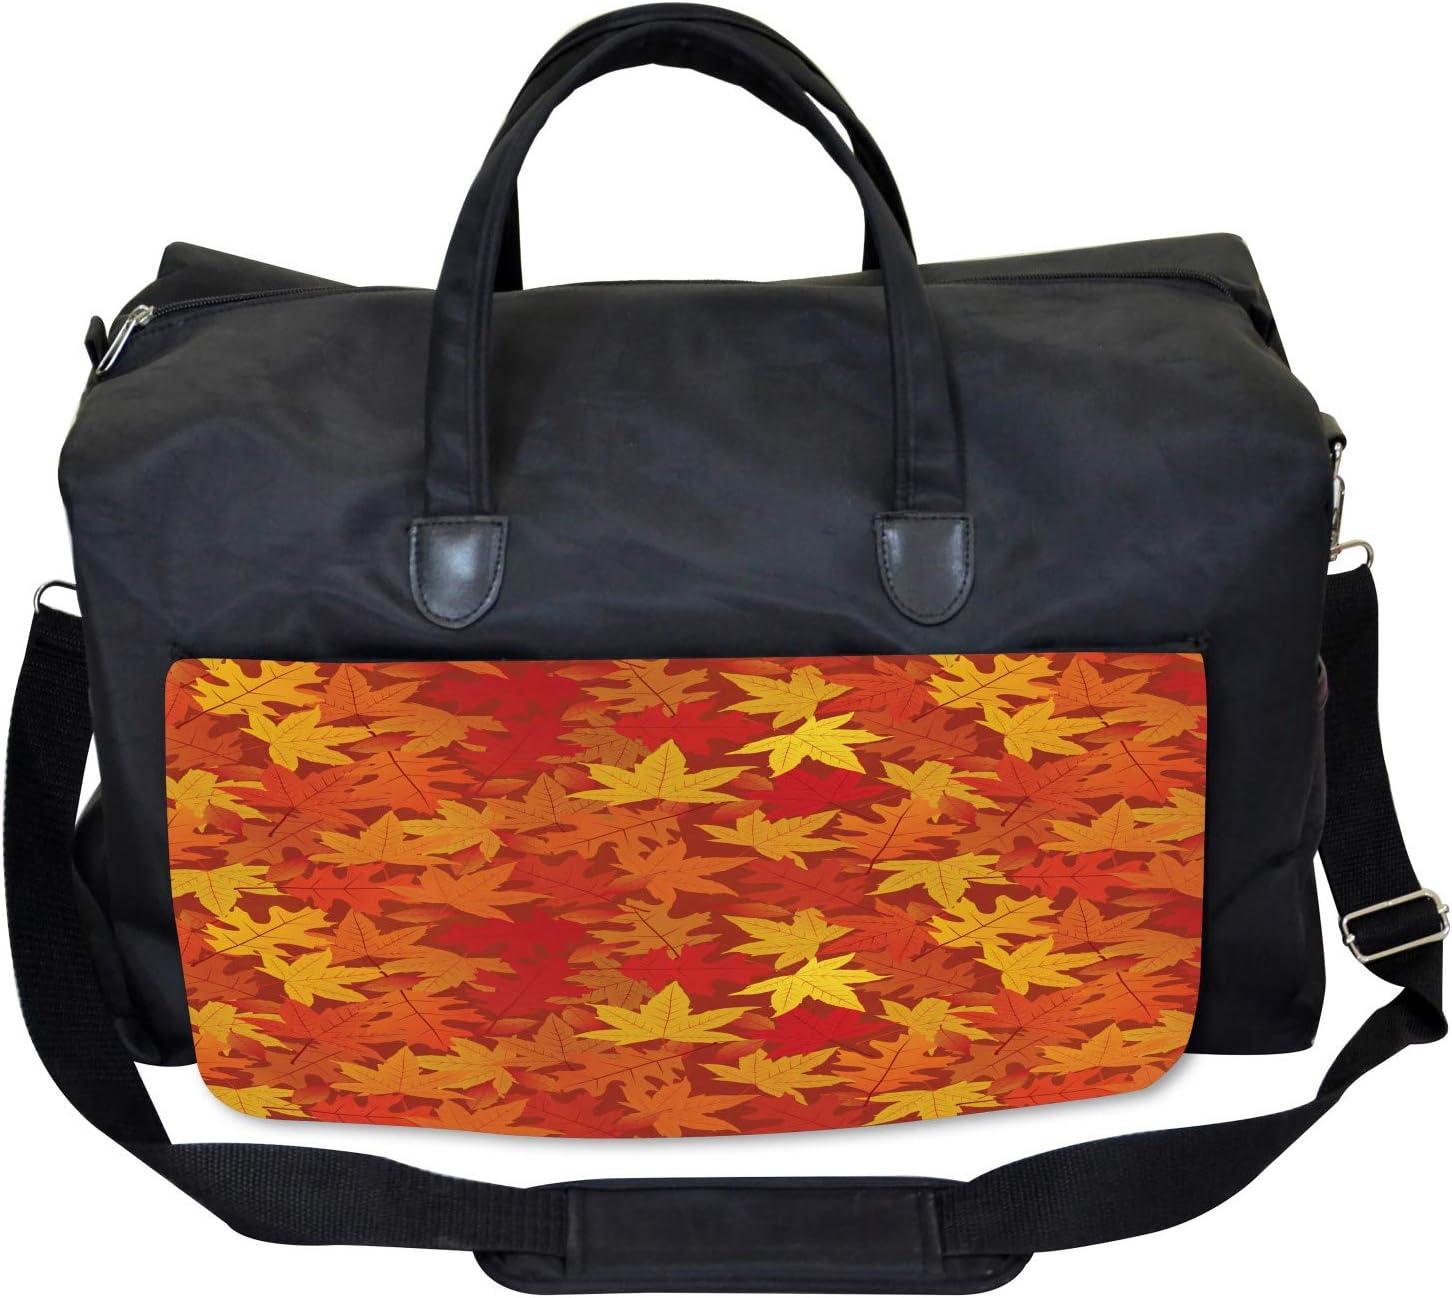 Nature Designs Artsy Large Weekender Carry-on Ambesonne Orange Gym Bag